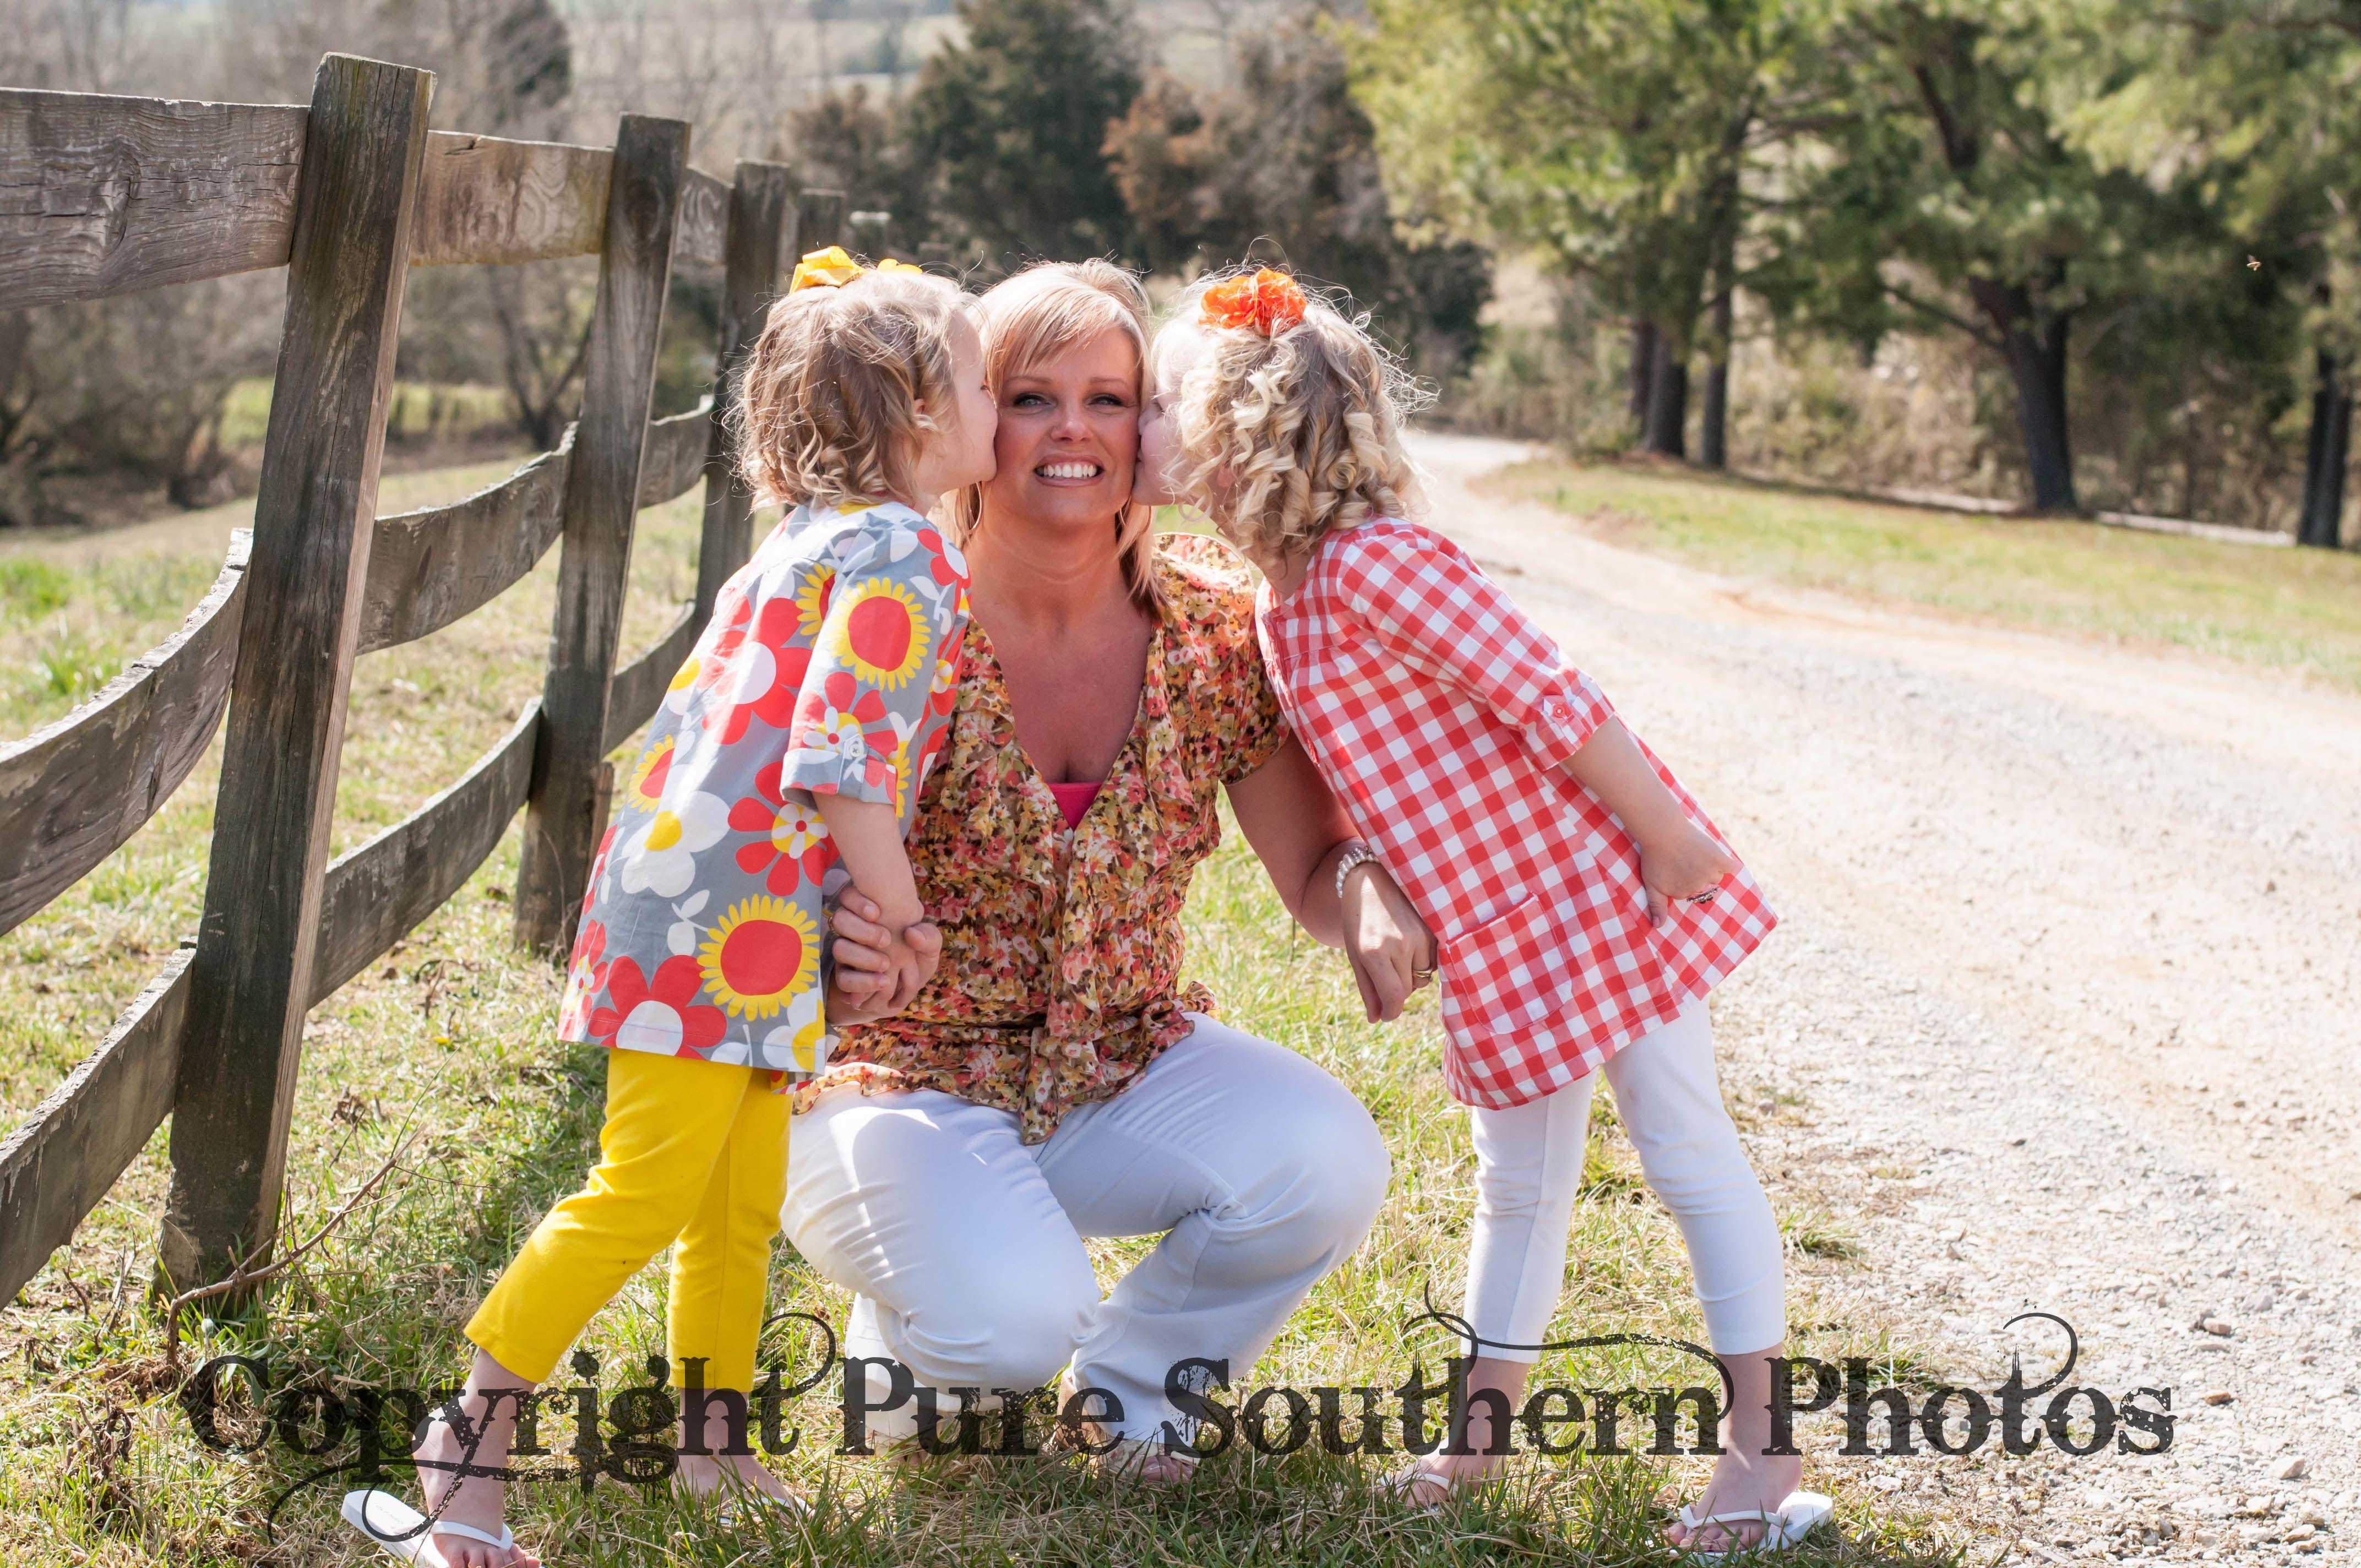 Easter family photo ideas